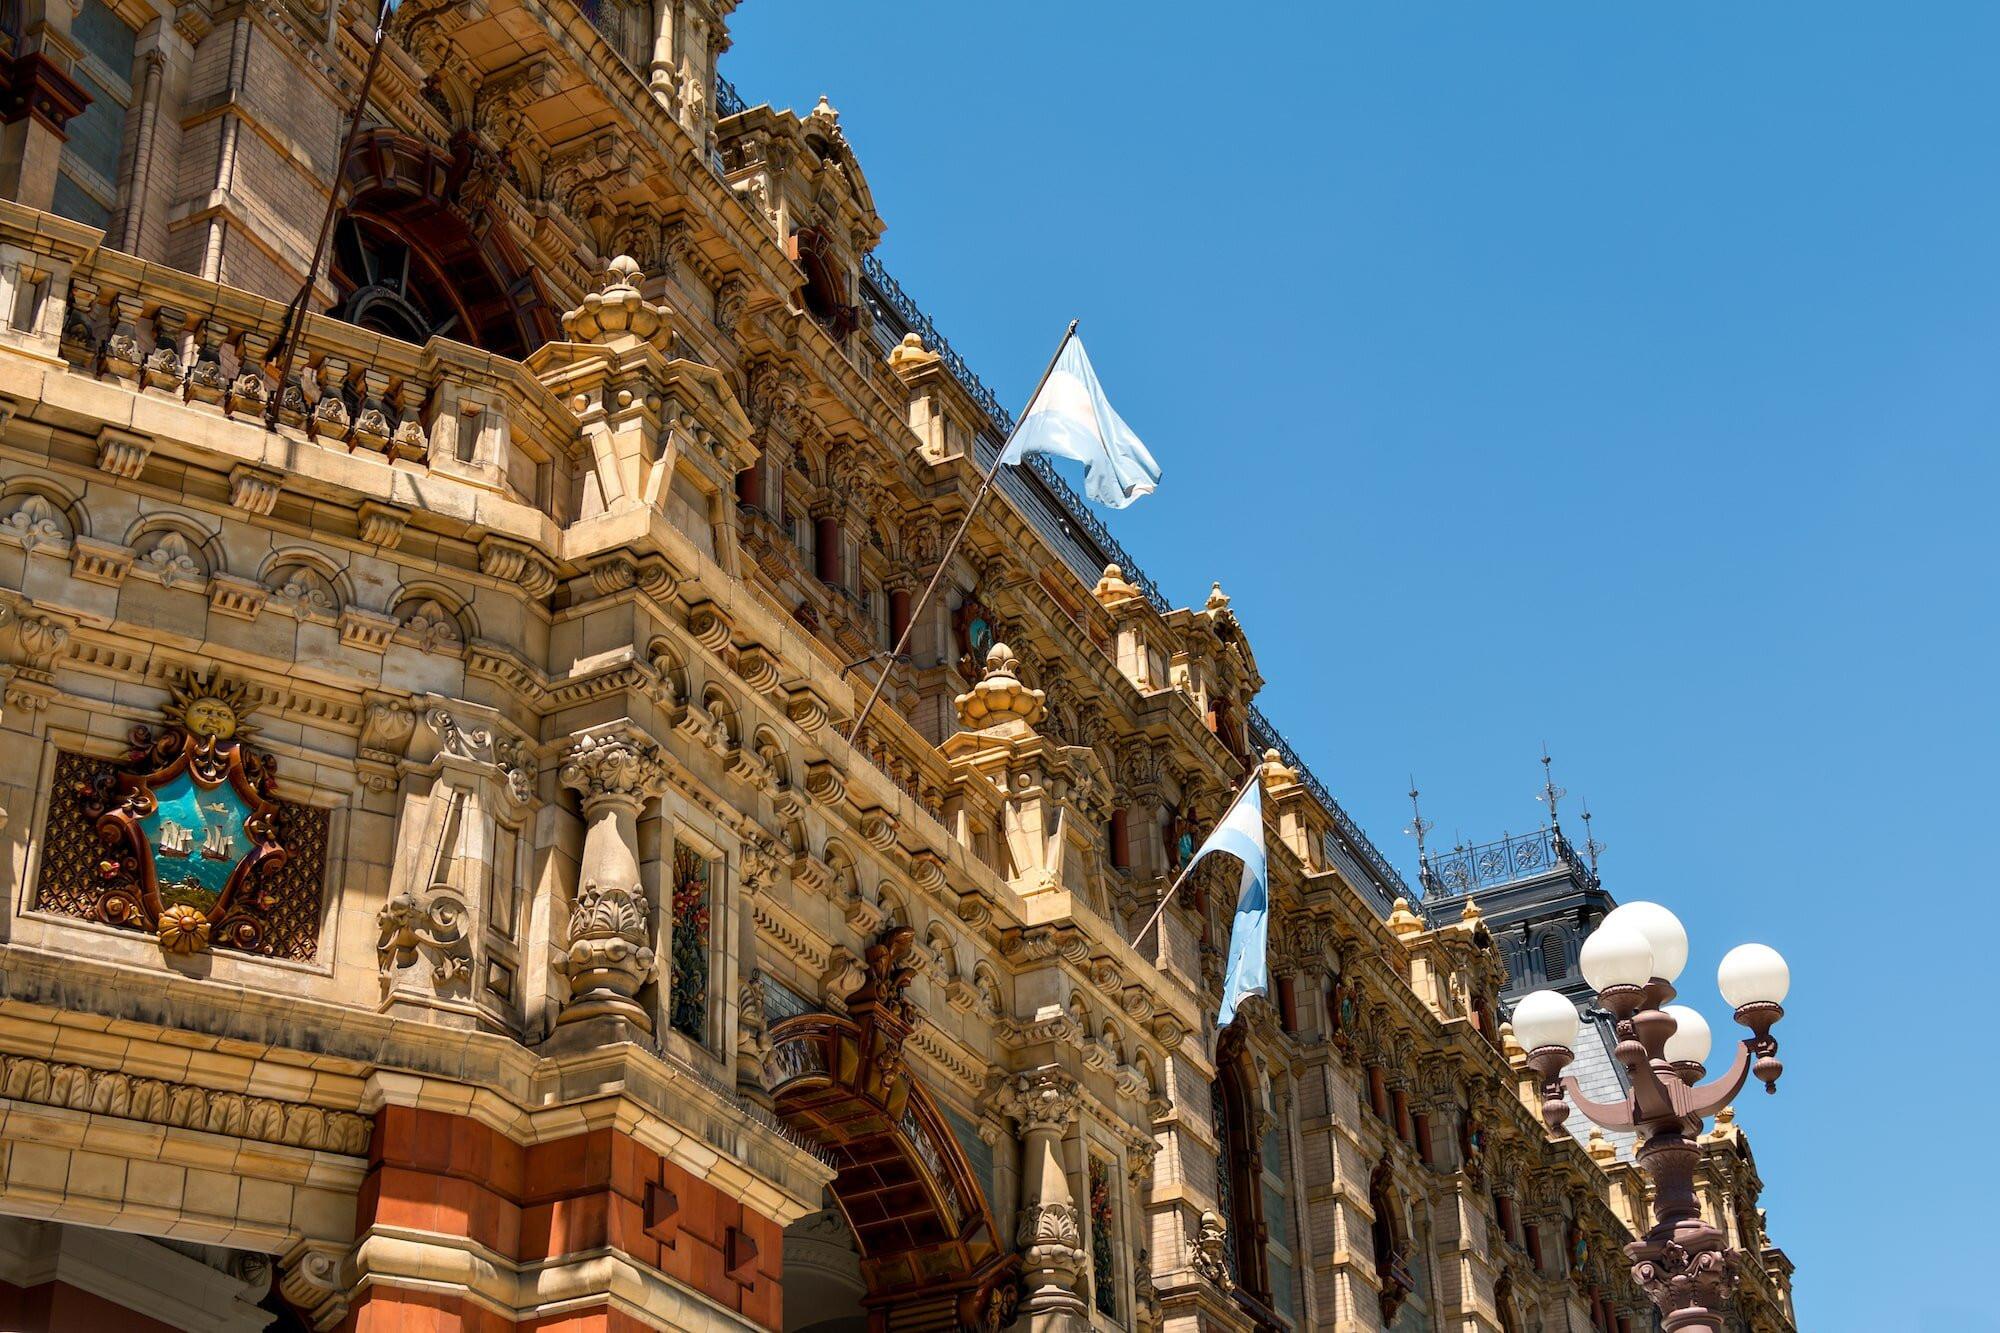 Impressive architecture in Buenos Aires